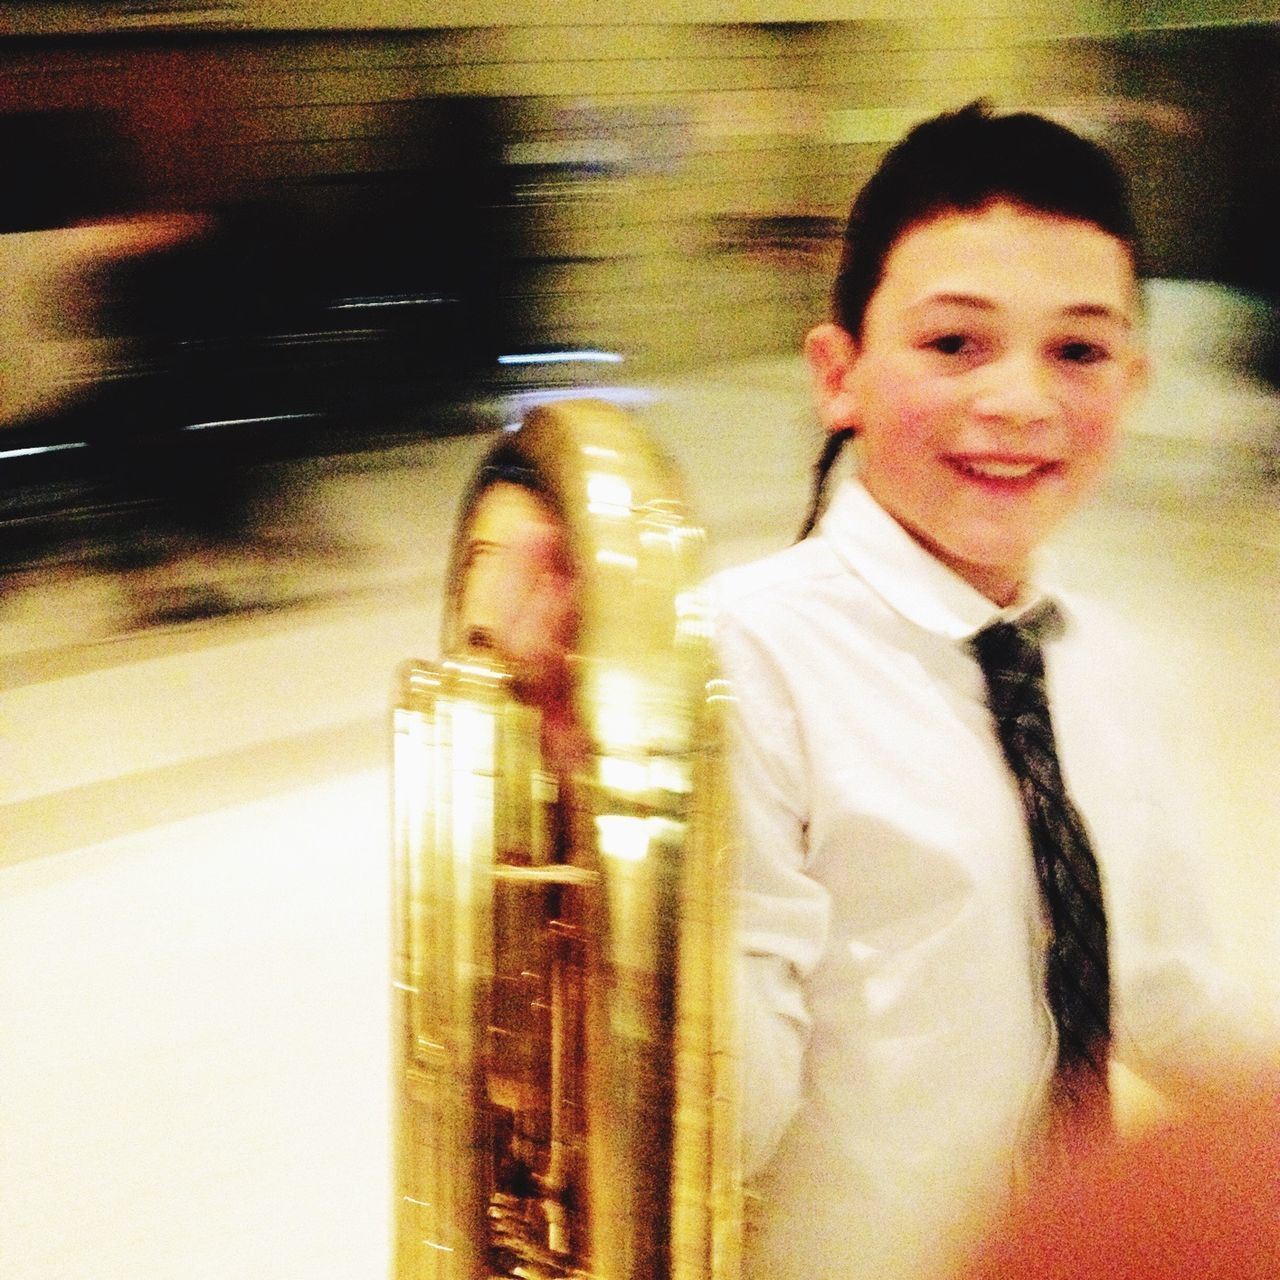 Concert Tuba Boy Band Blurred Motion Focal Point Blurred Background